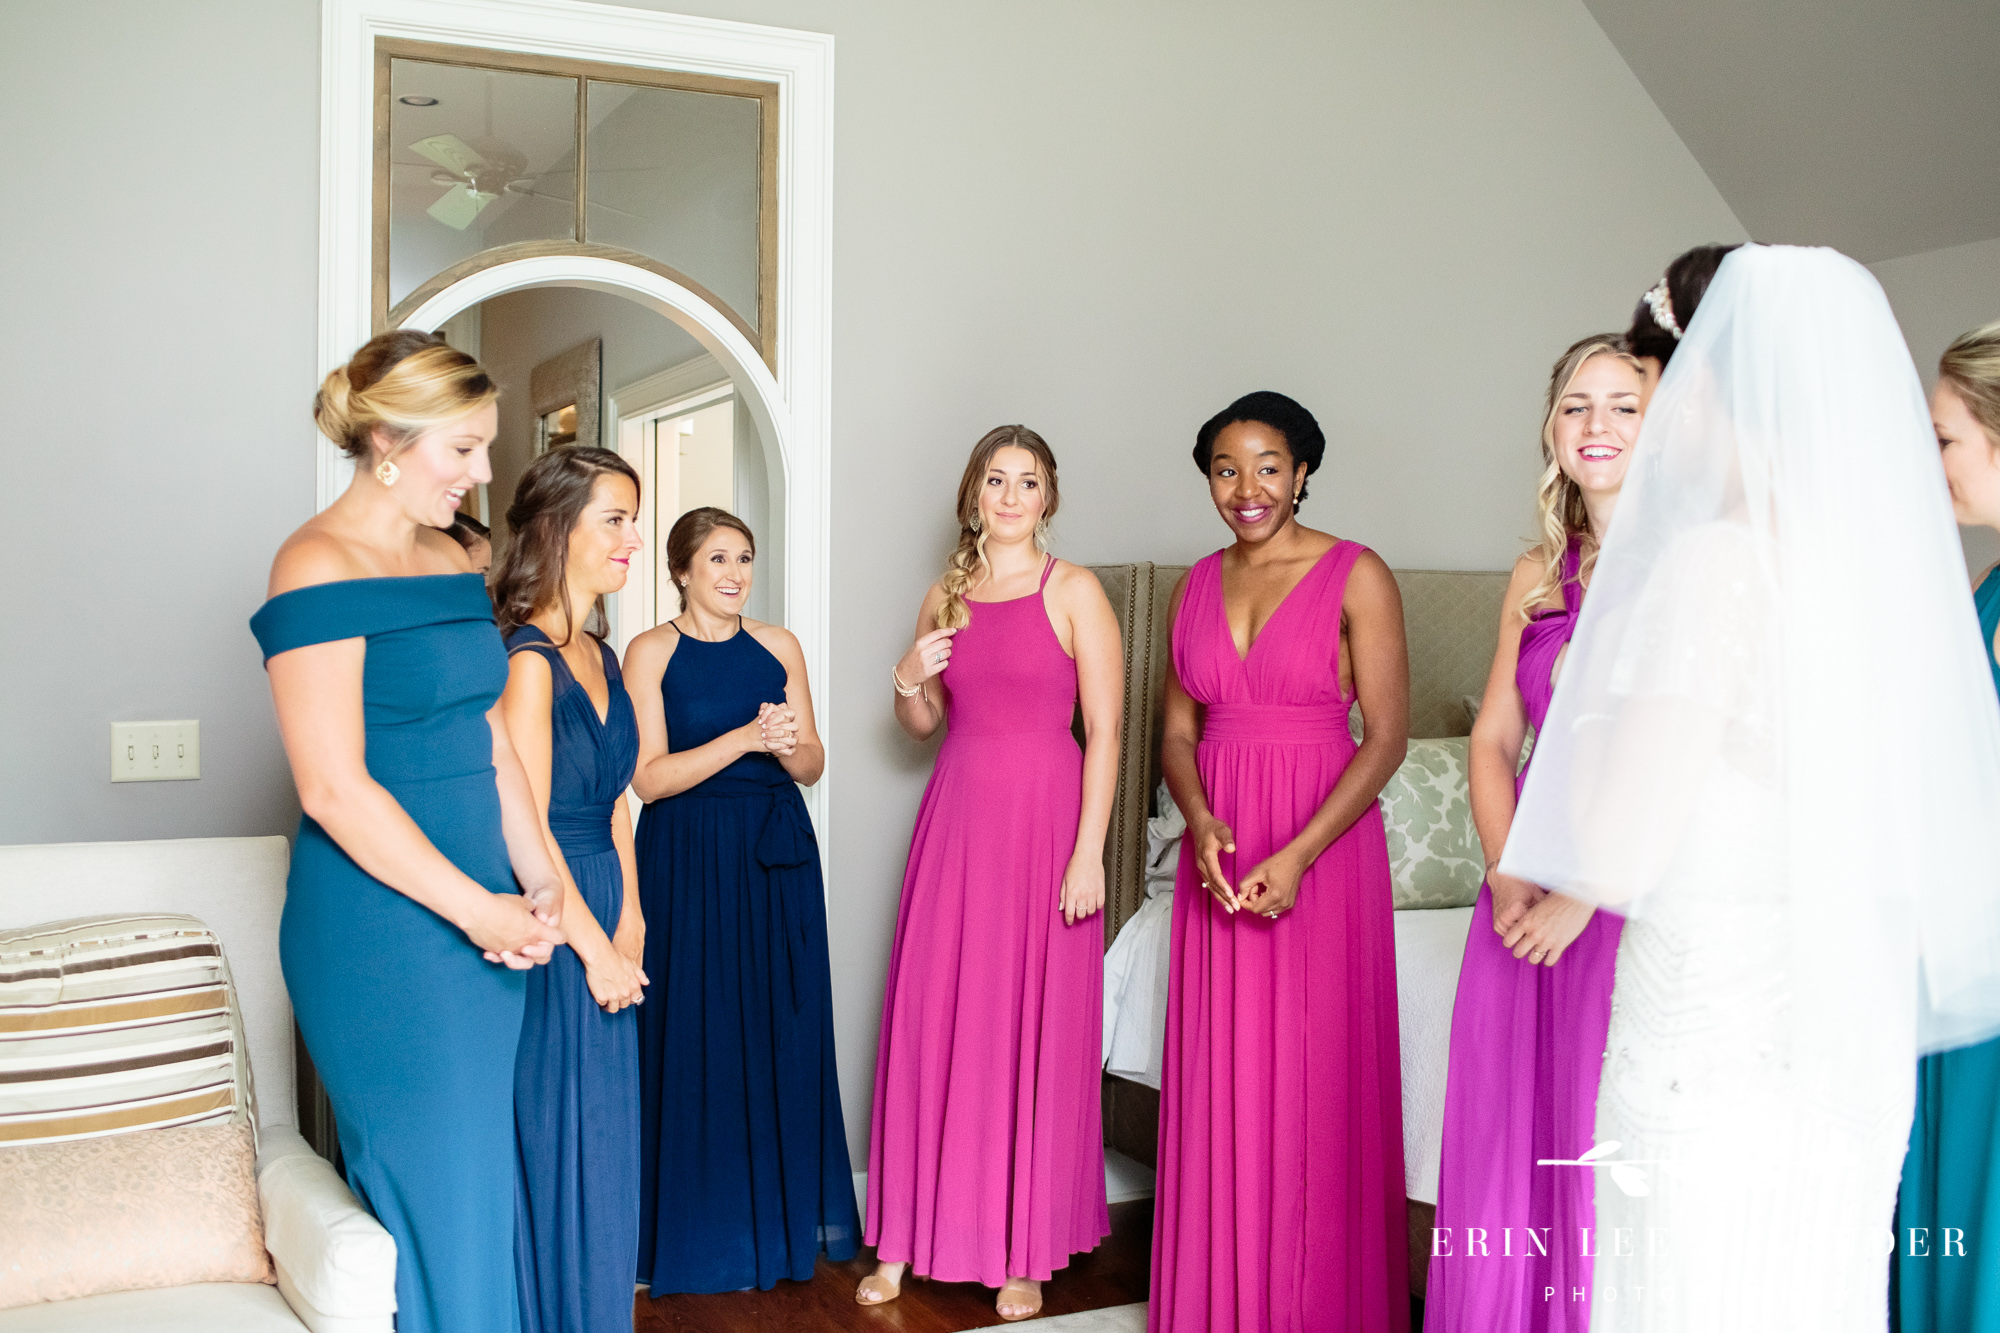 Jewel_Tone_Bridesmaids_Dresses